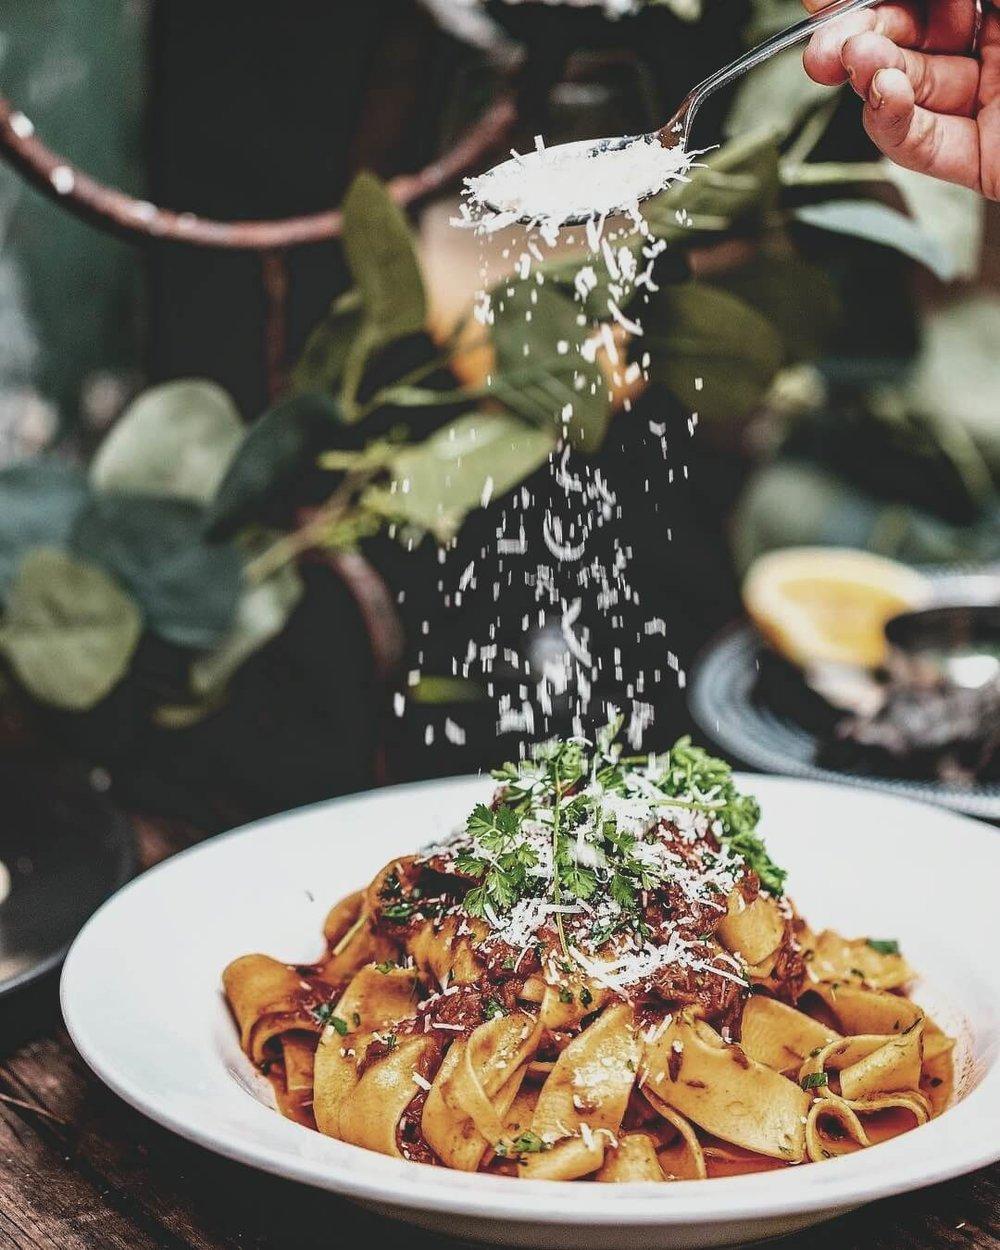 Pasta dish at Vino e Cucina, paddington in Sydney